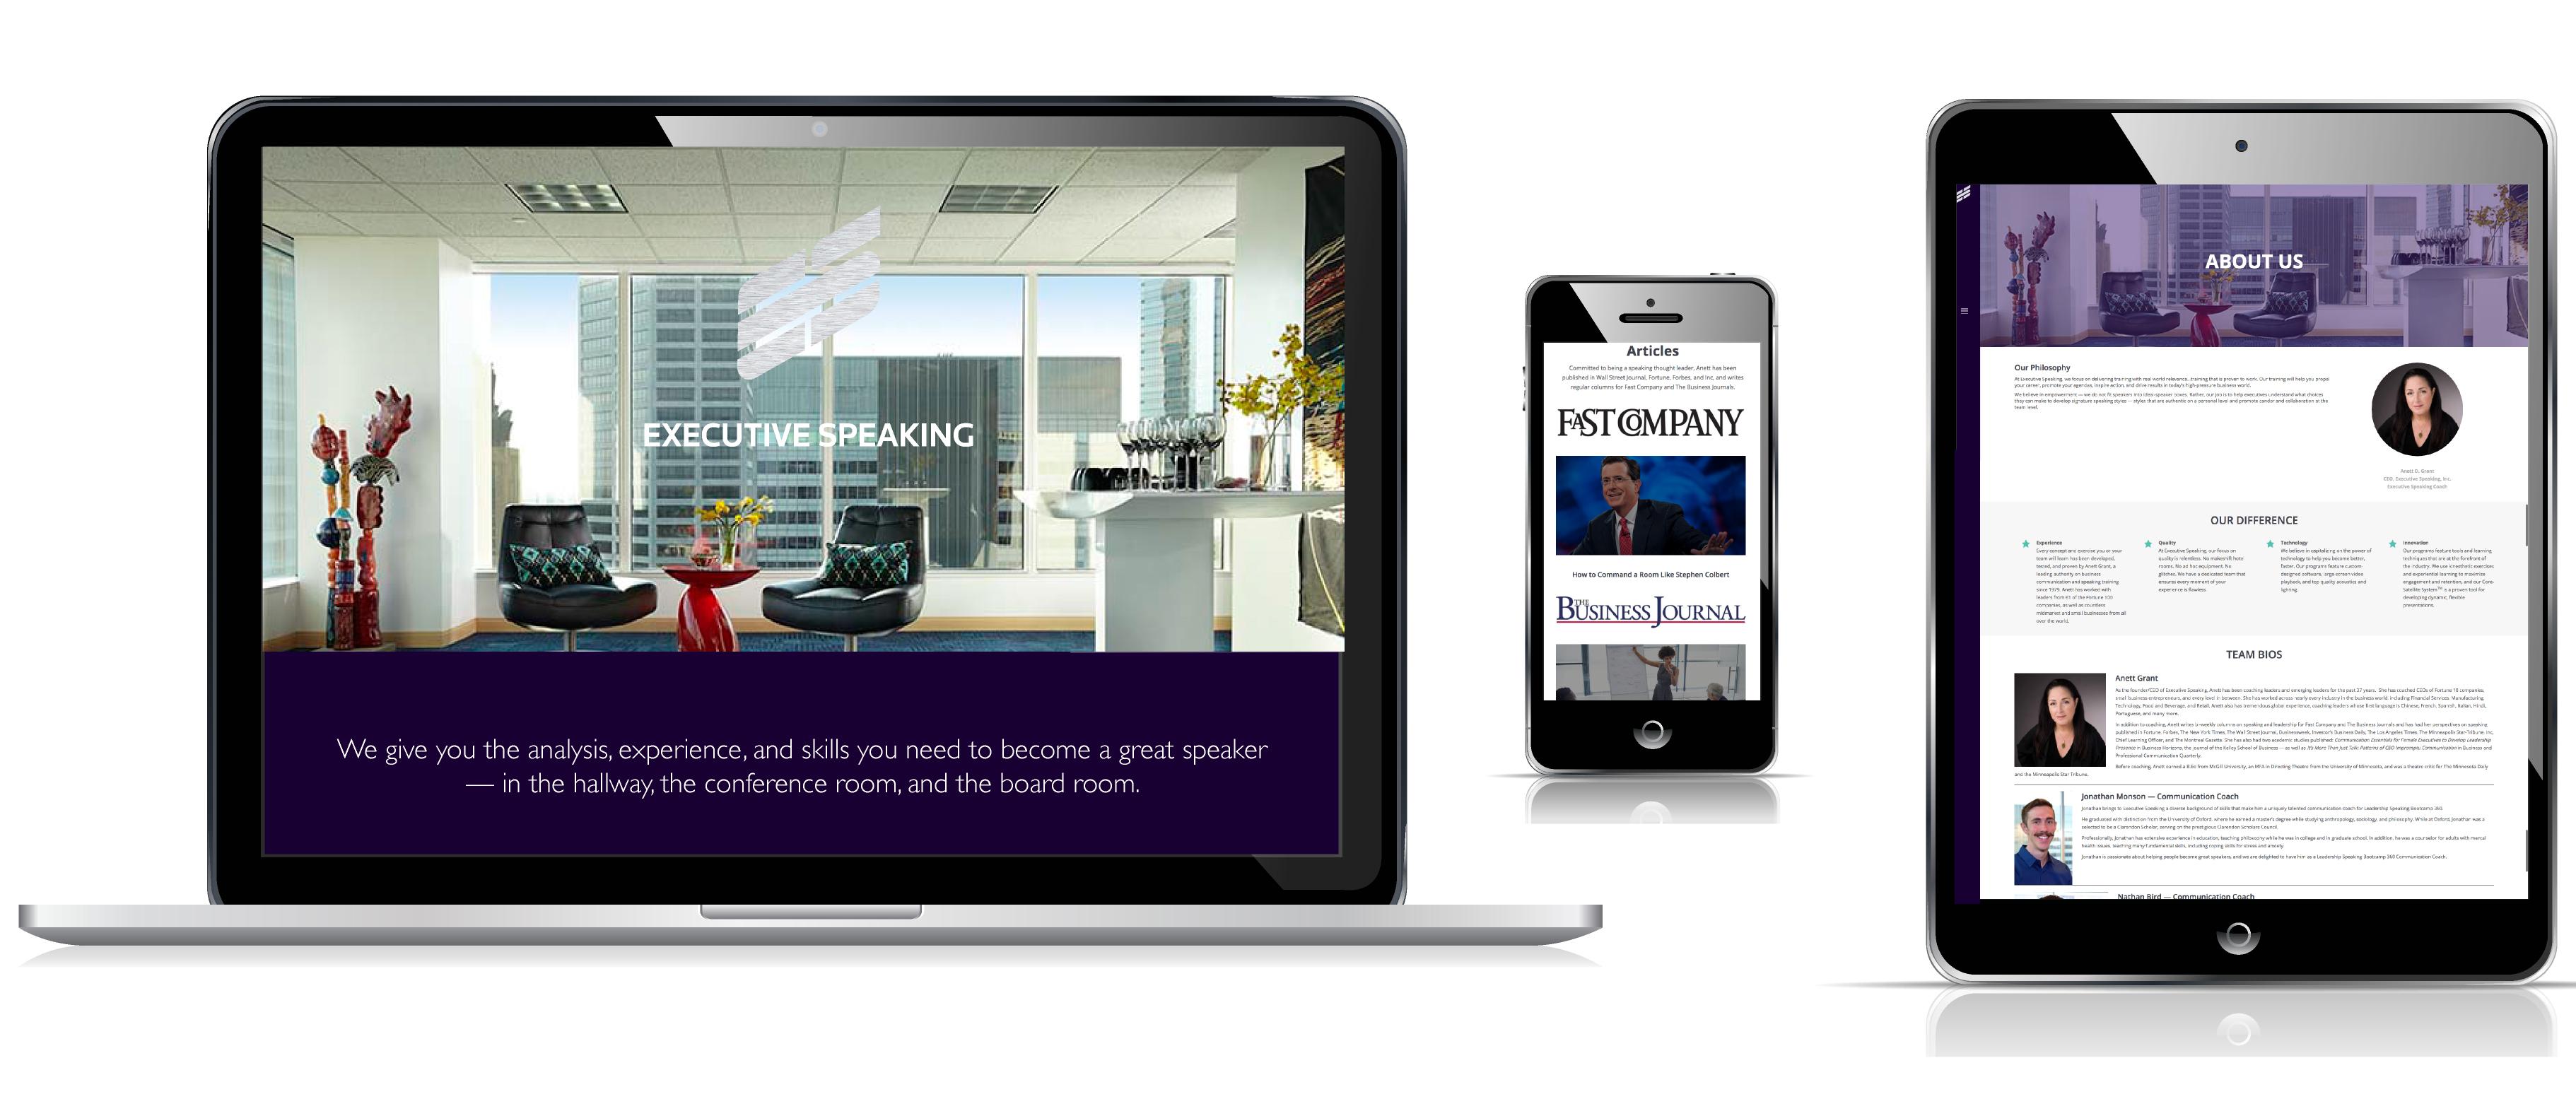 Executive Speaking Responsive Website Redesign